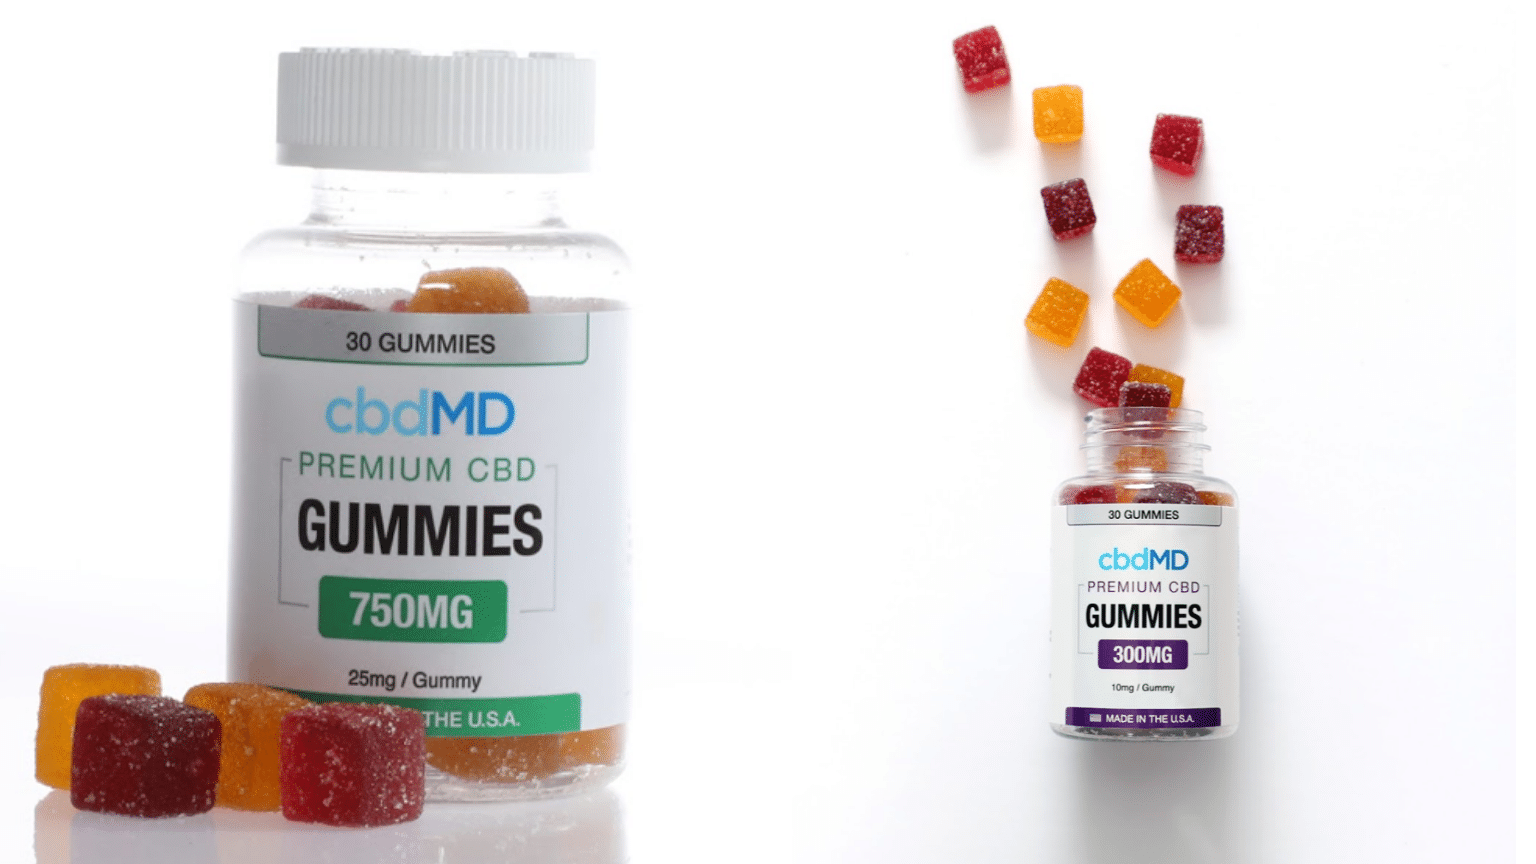 cbdmd-gummies-bottle-examples